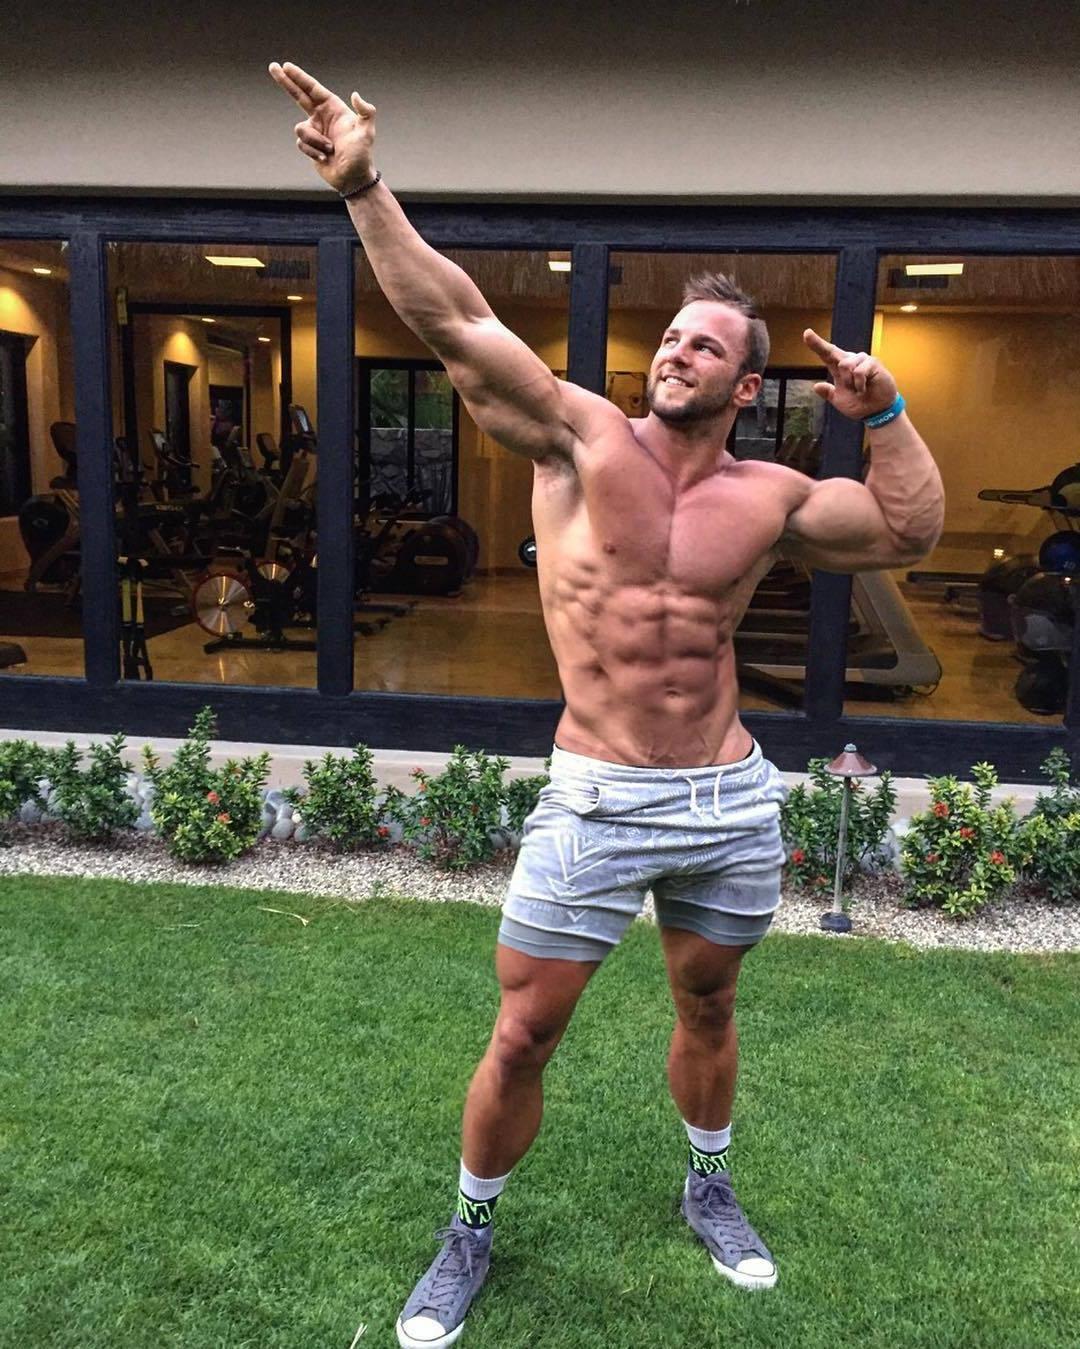 cocky-muscular-dads-eric-janicki-shirtless-biceps-flex